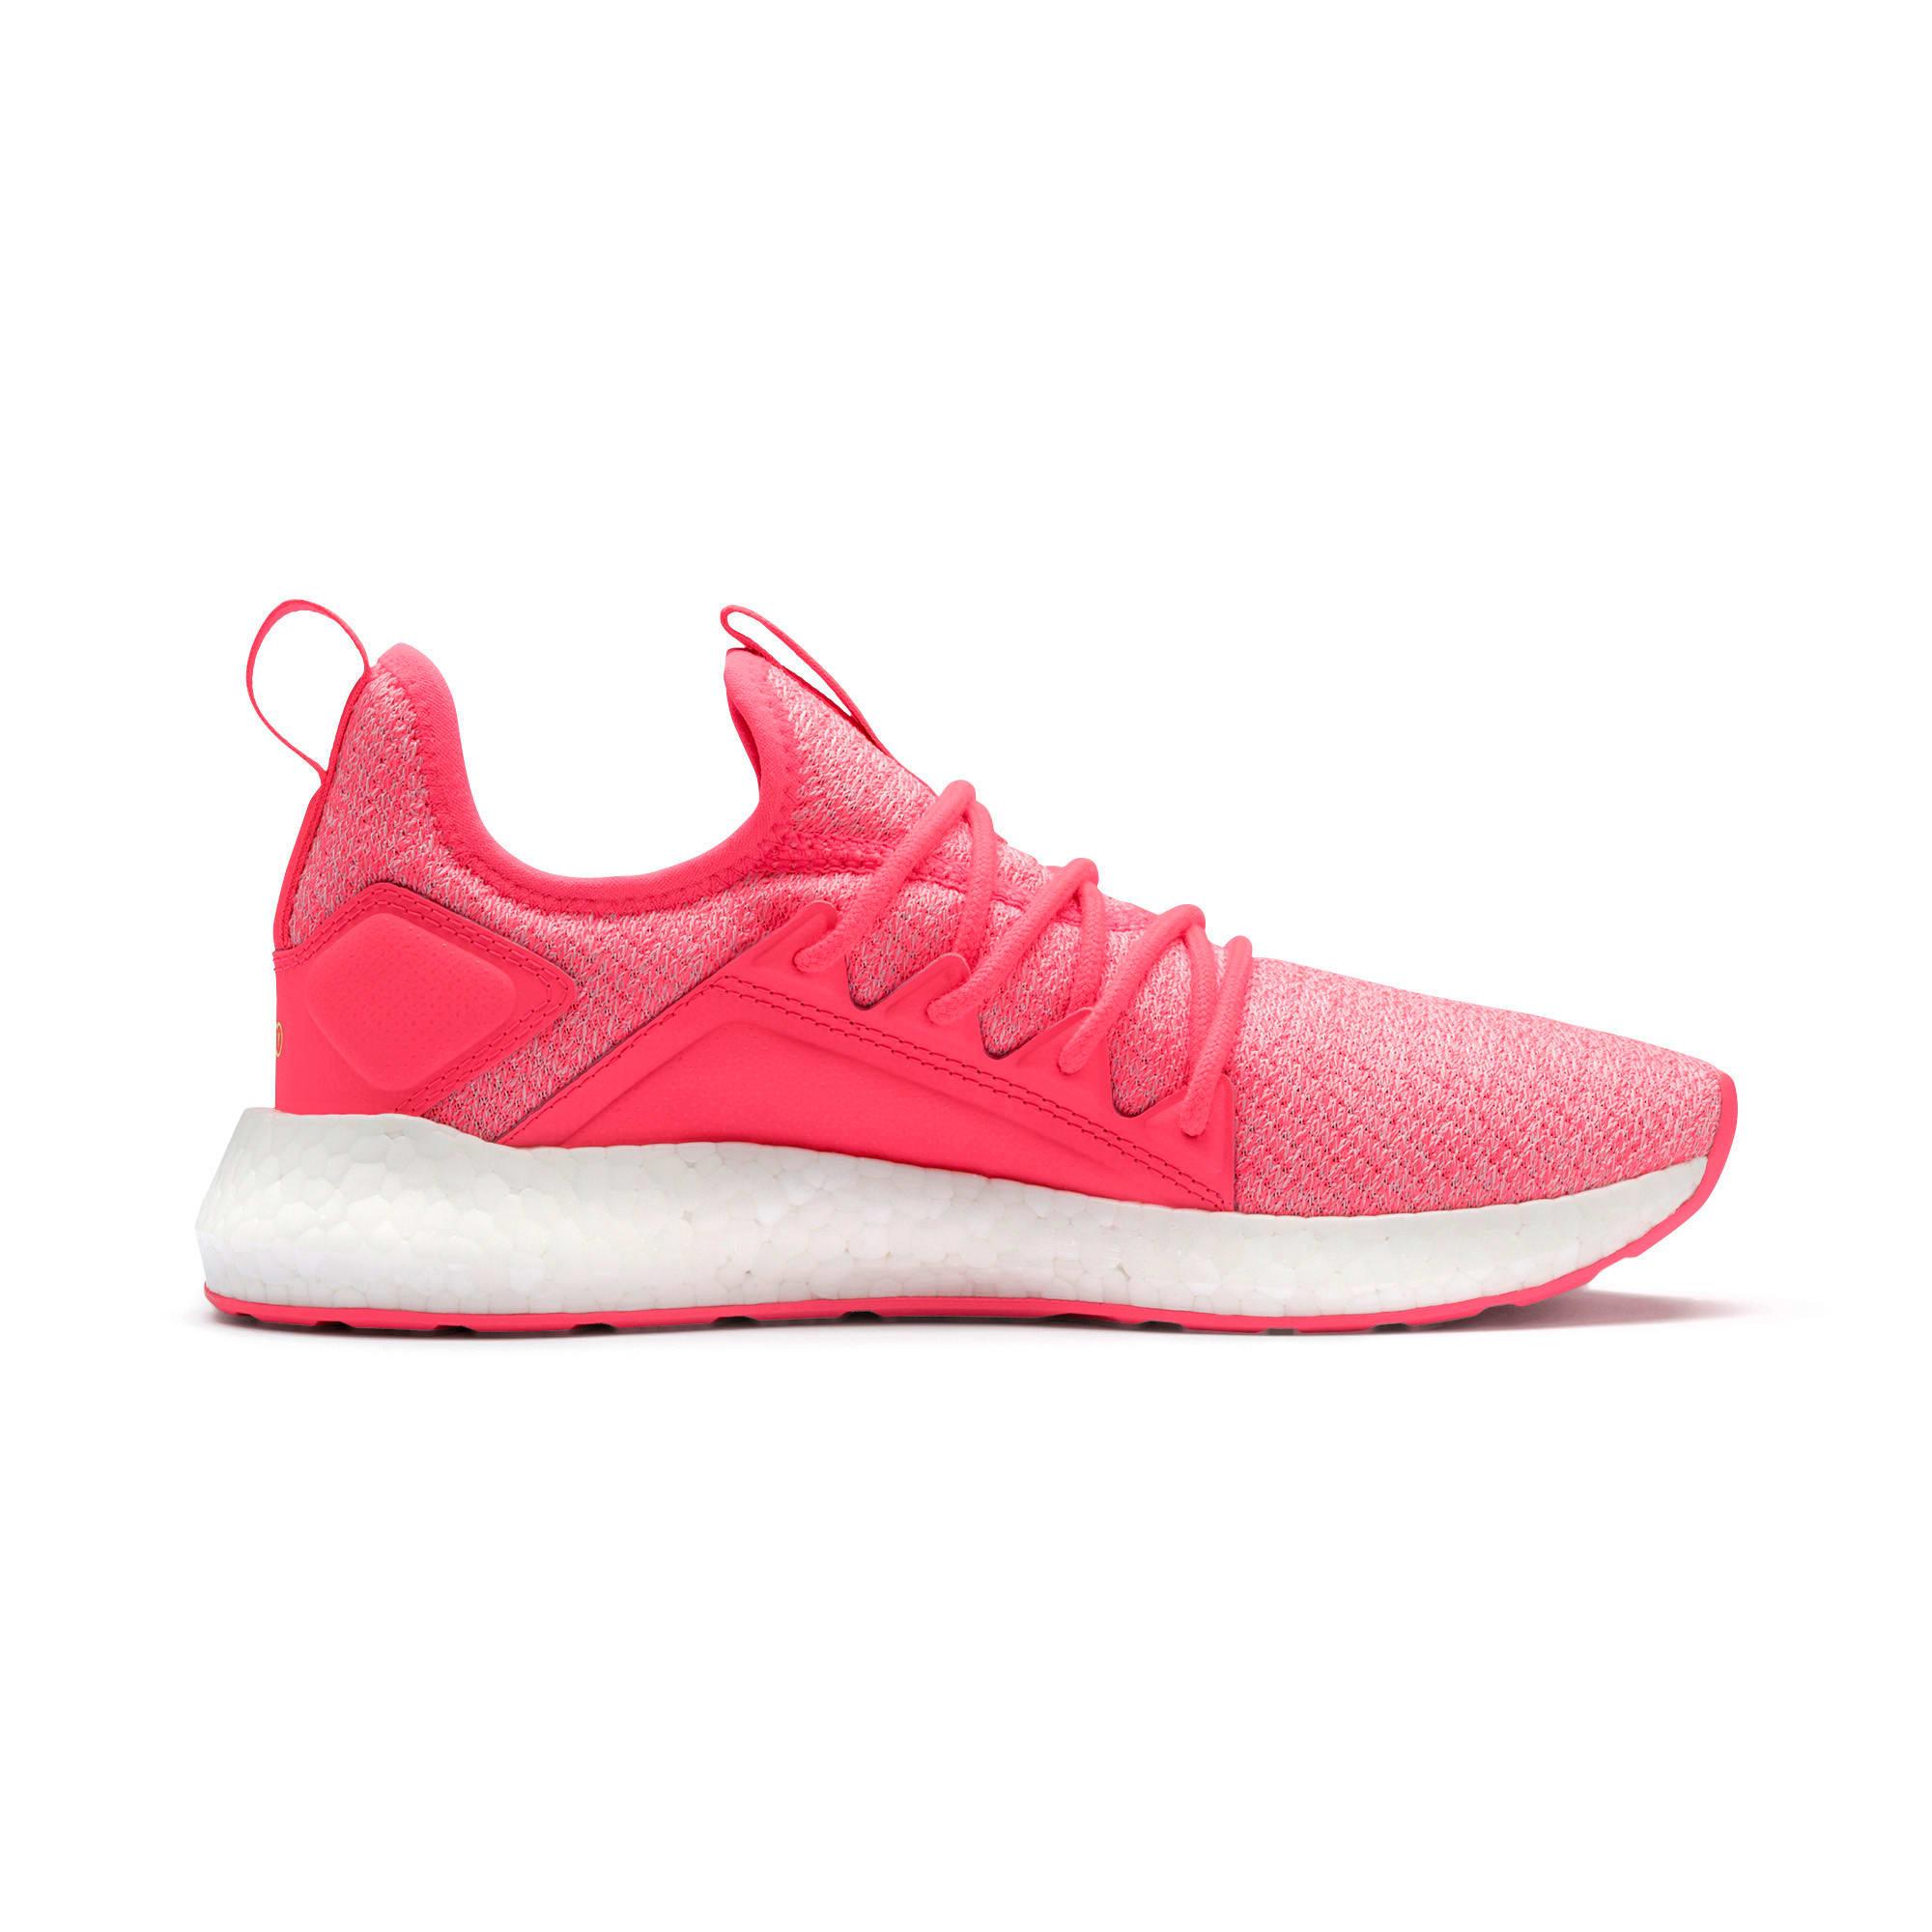 Thumbnail 6 of NRGY Neko Knit Women's Running Shoes, Pink Alert-Puma White, medium